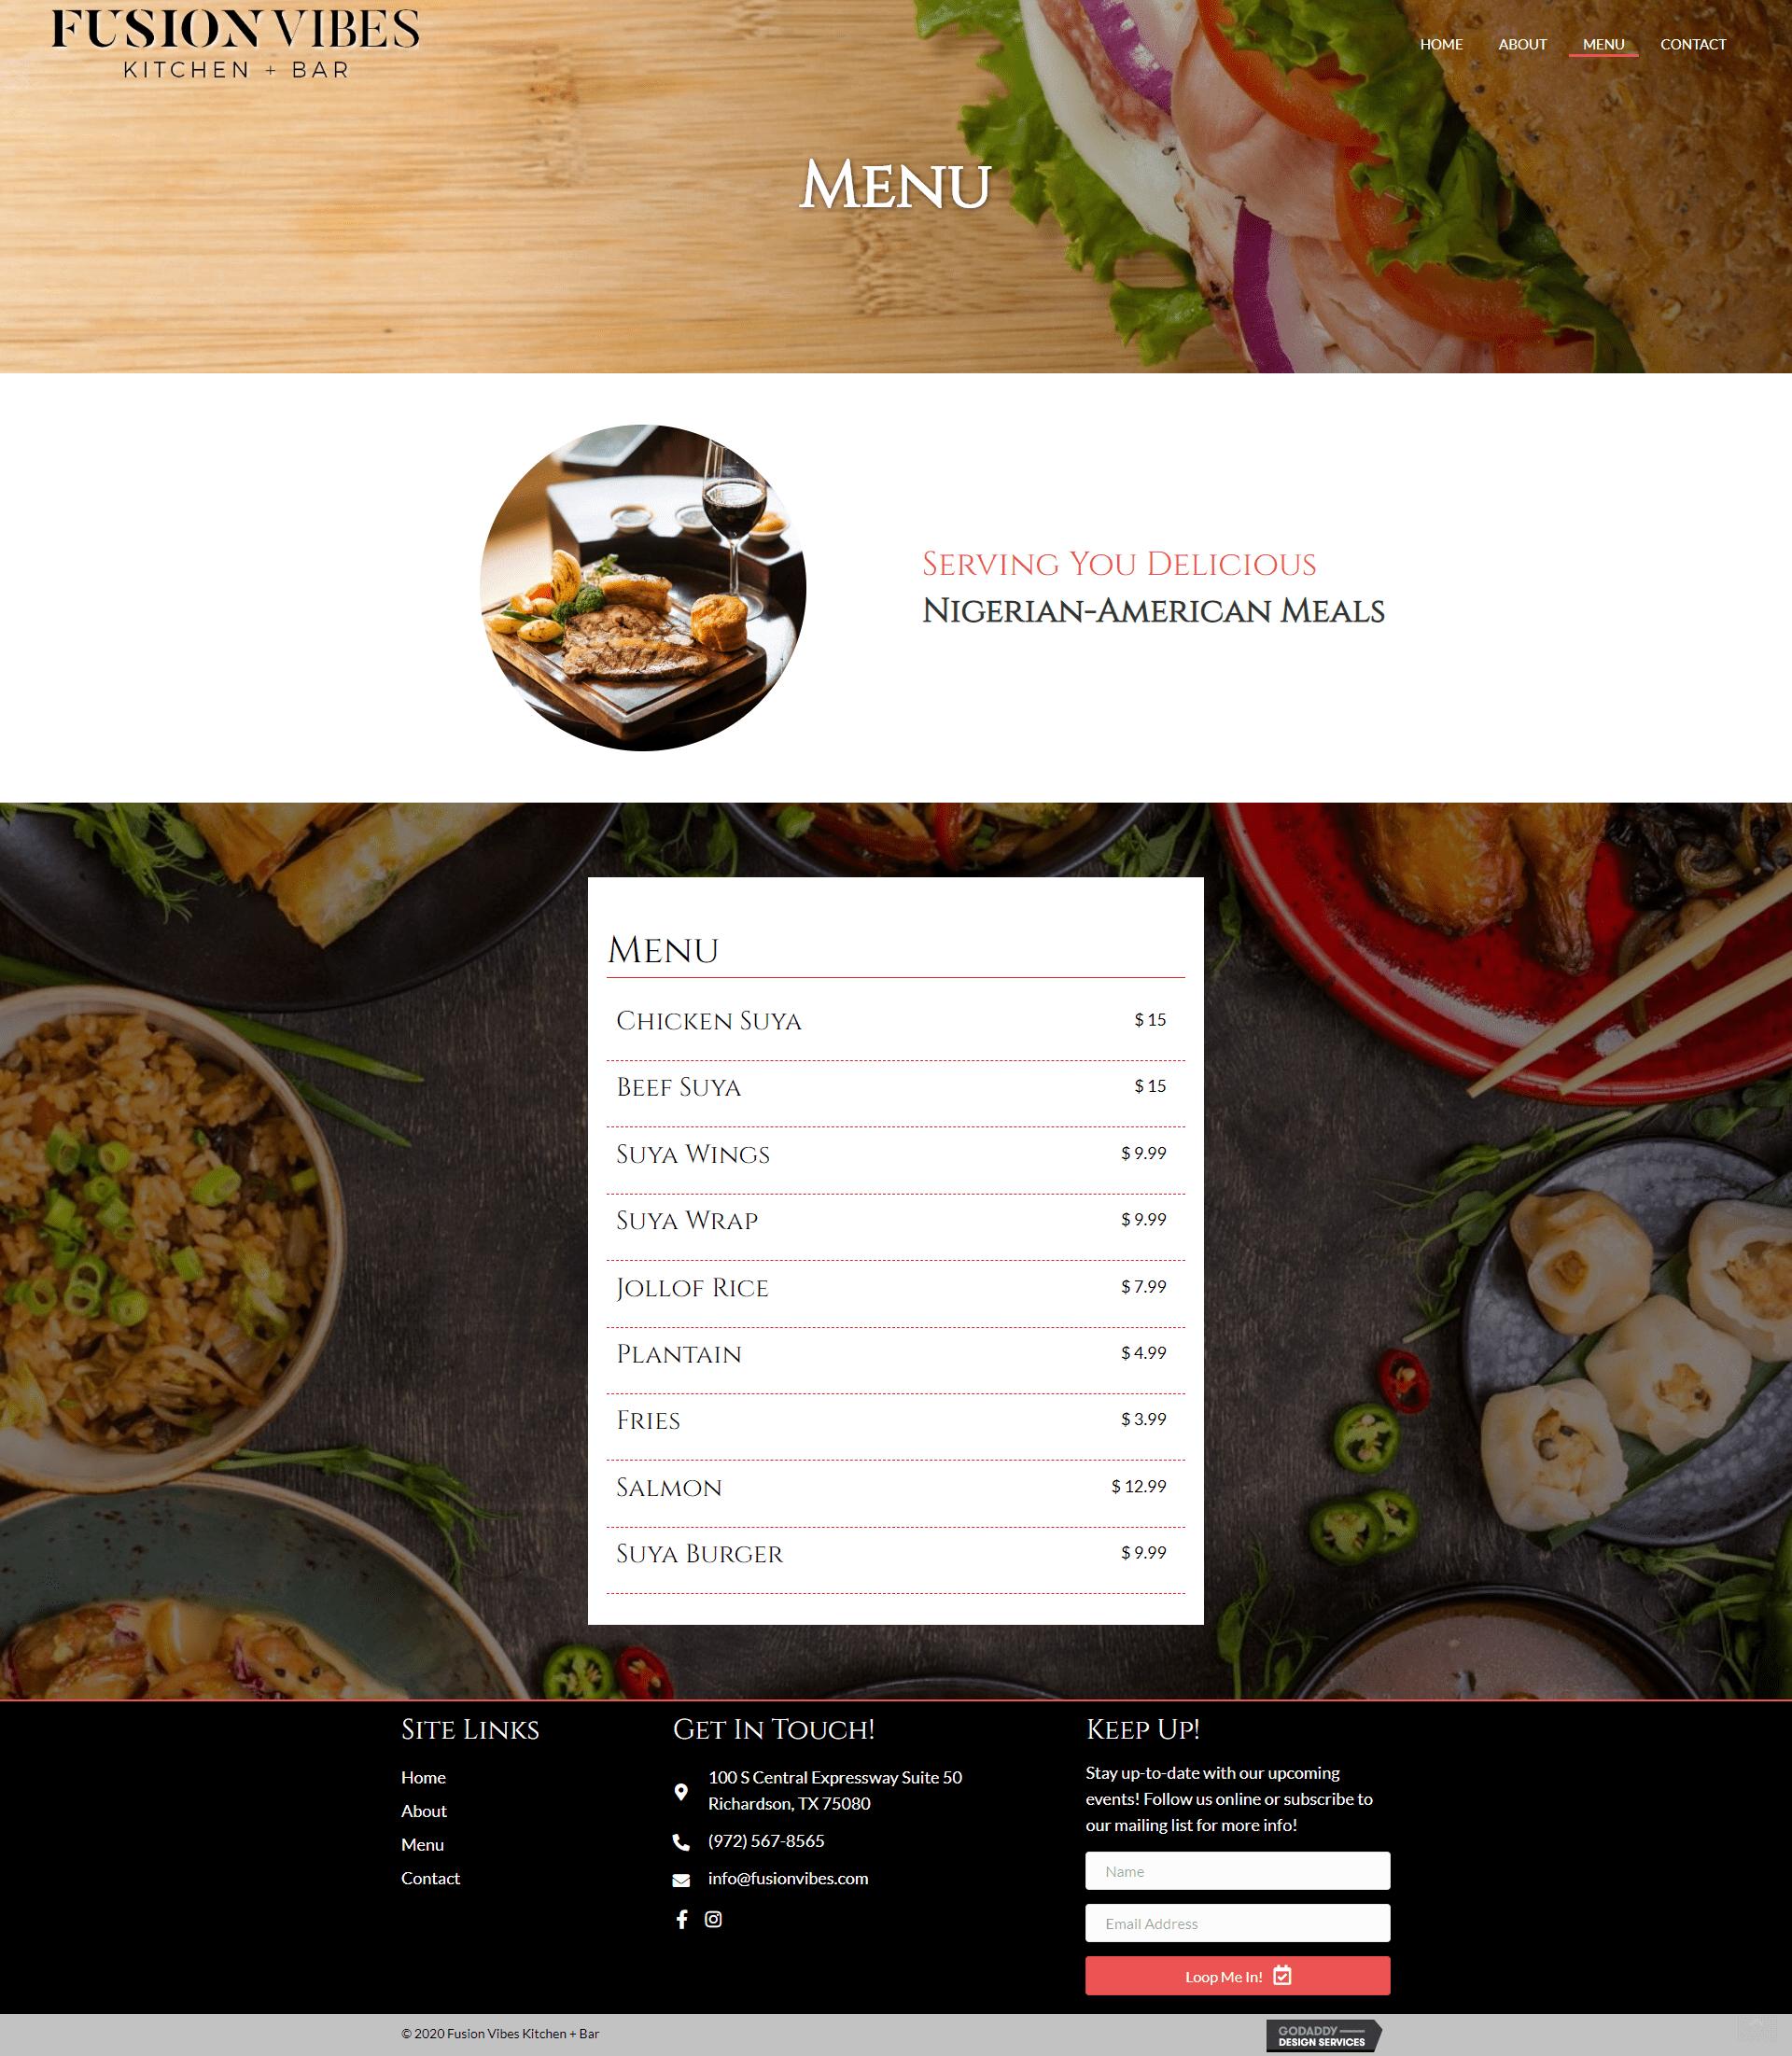 screencapture-w41-562-myftpupload-menu